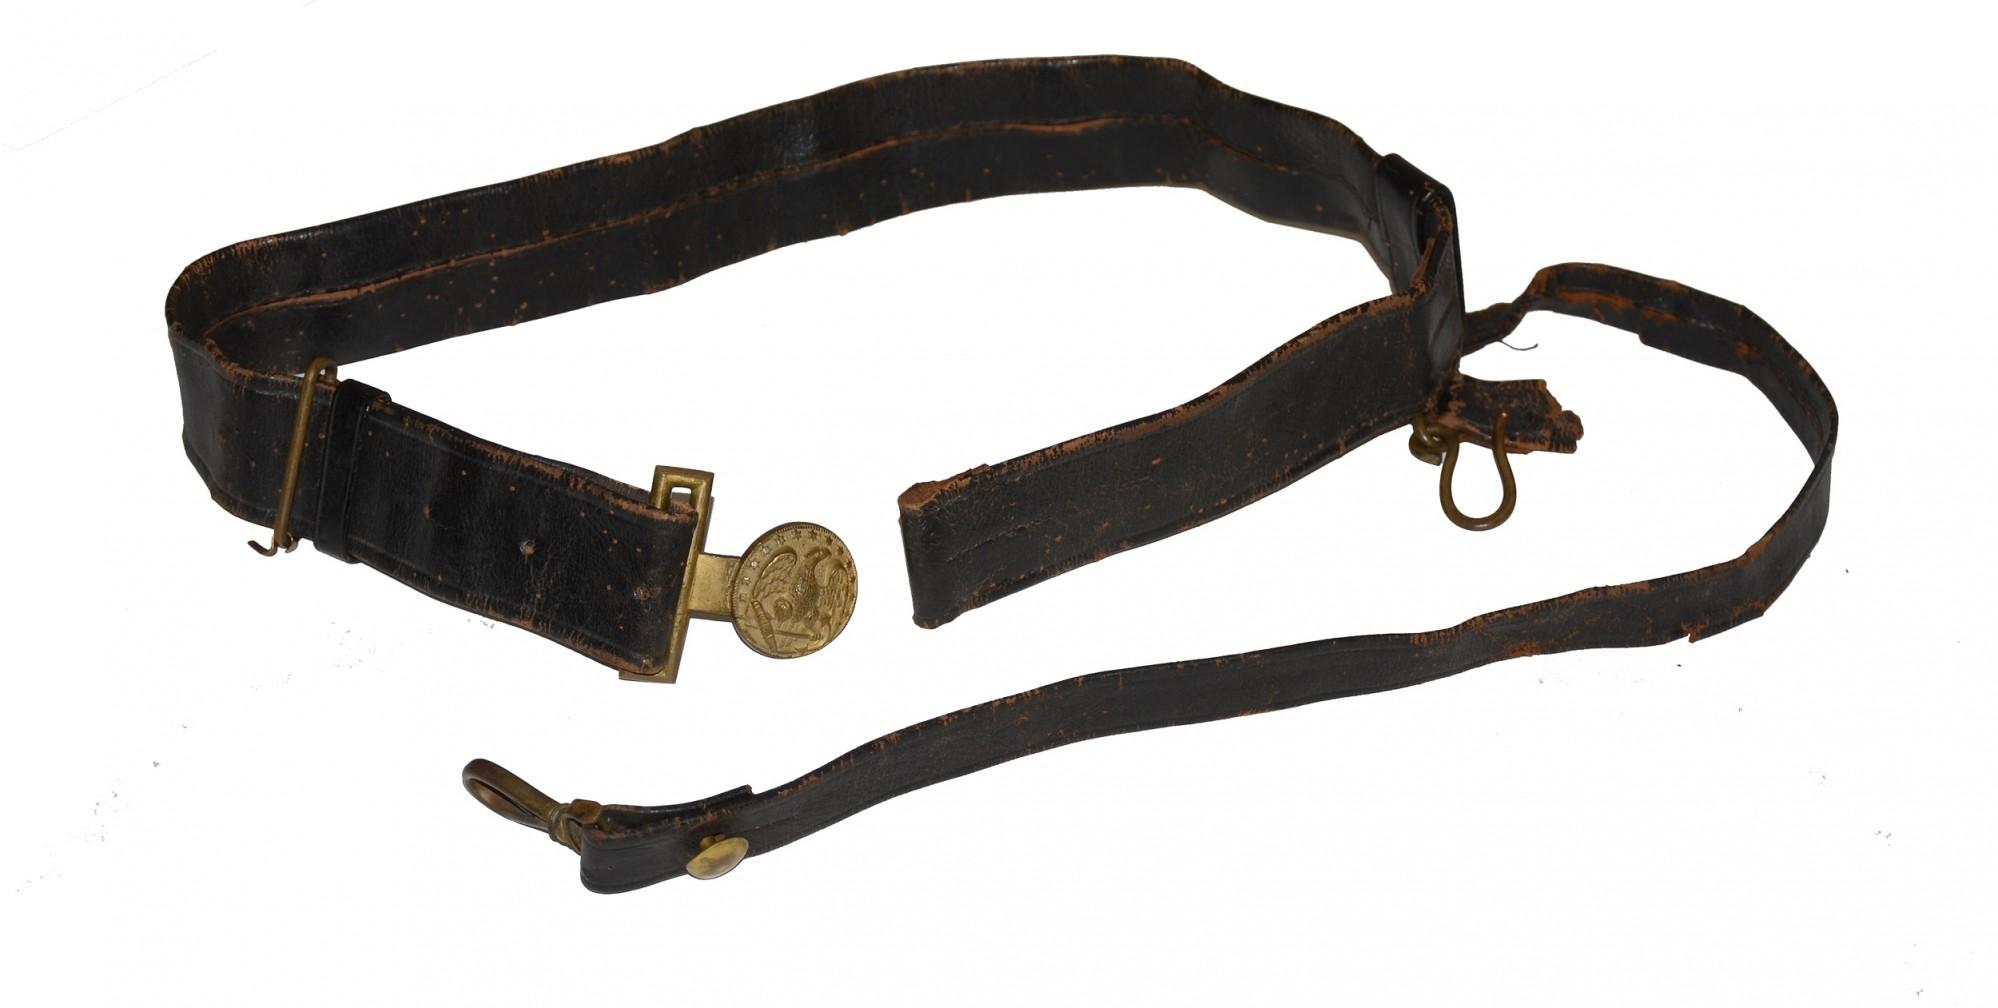 IDENTIFIED CIVIL WAR NAVY OFFICERS BELT Horse Soldier